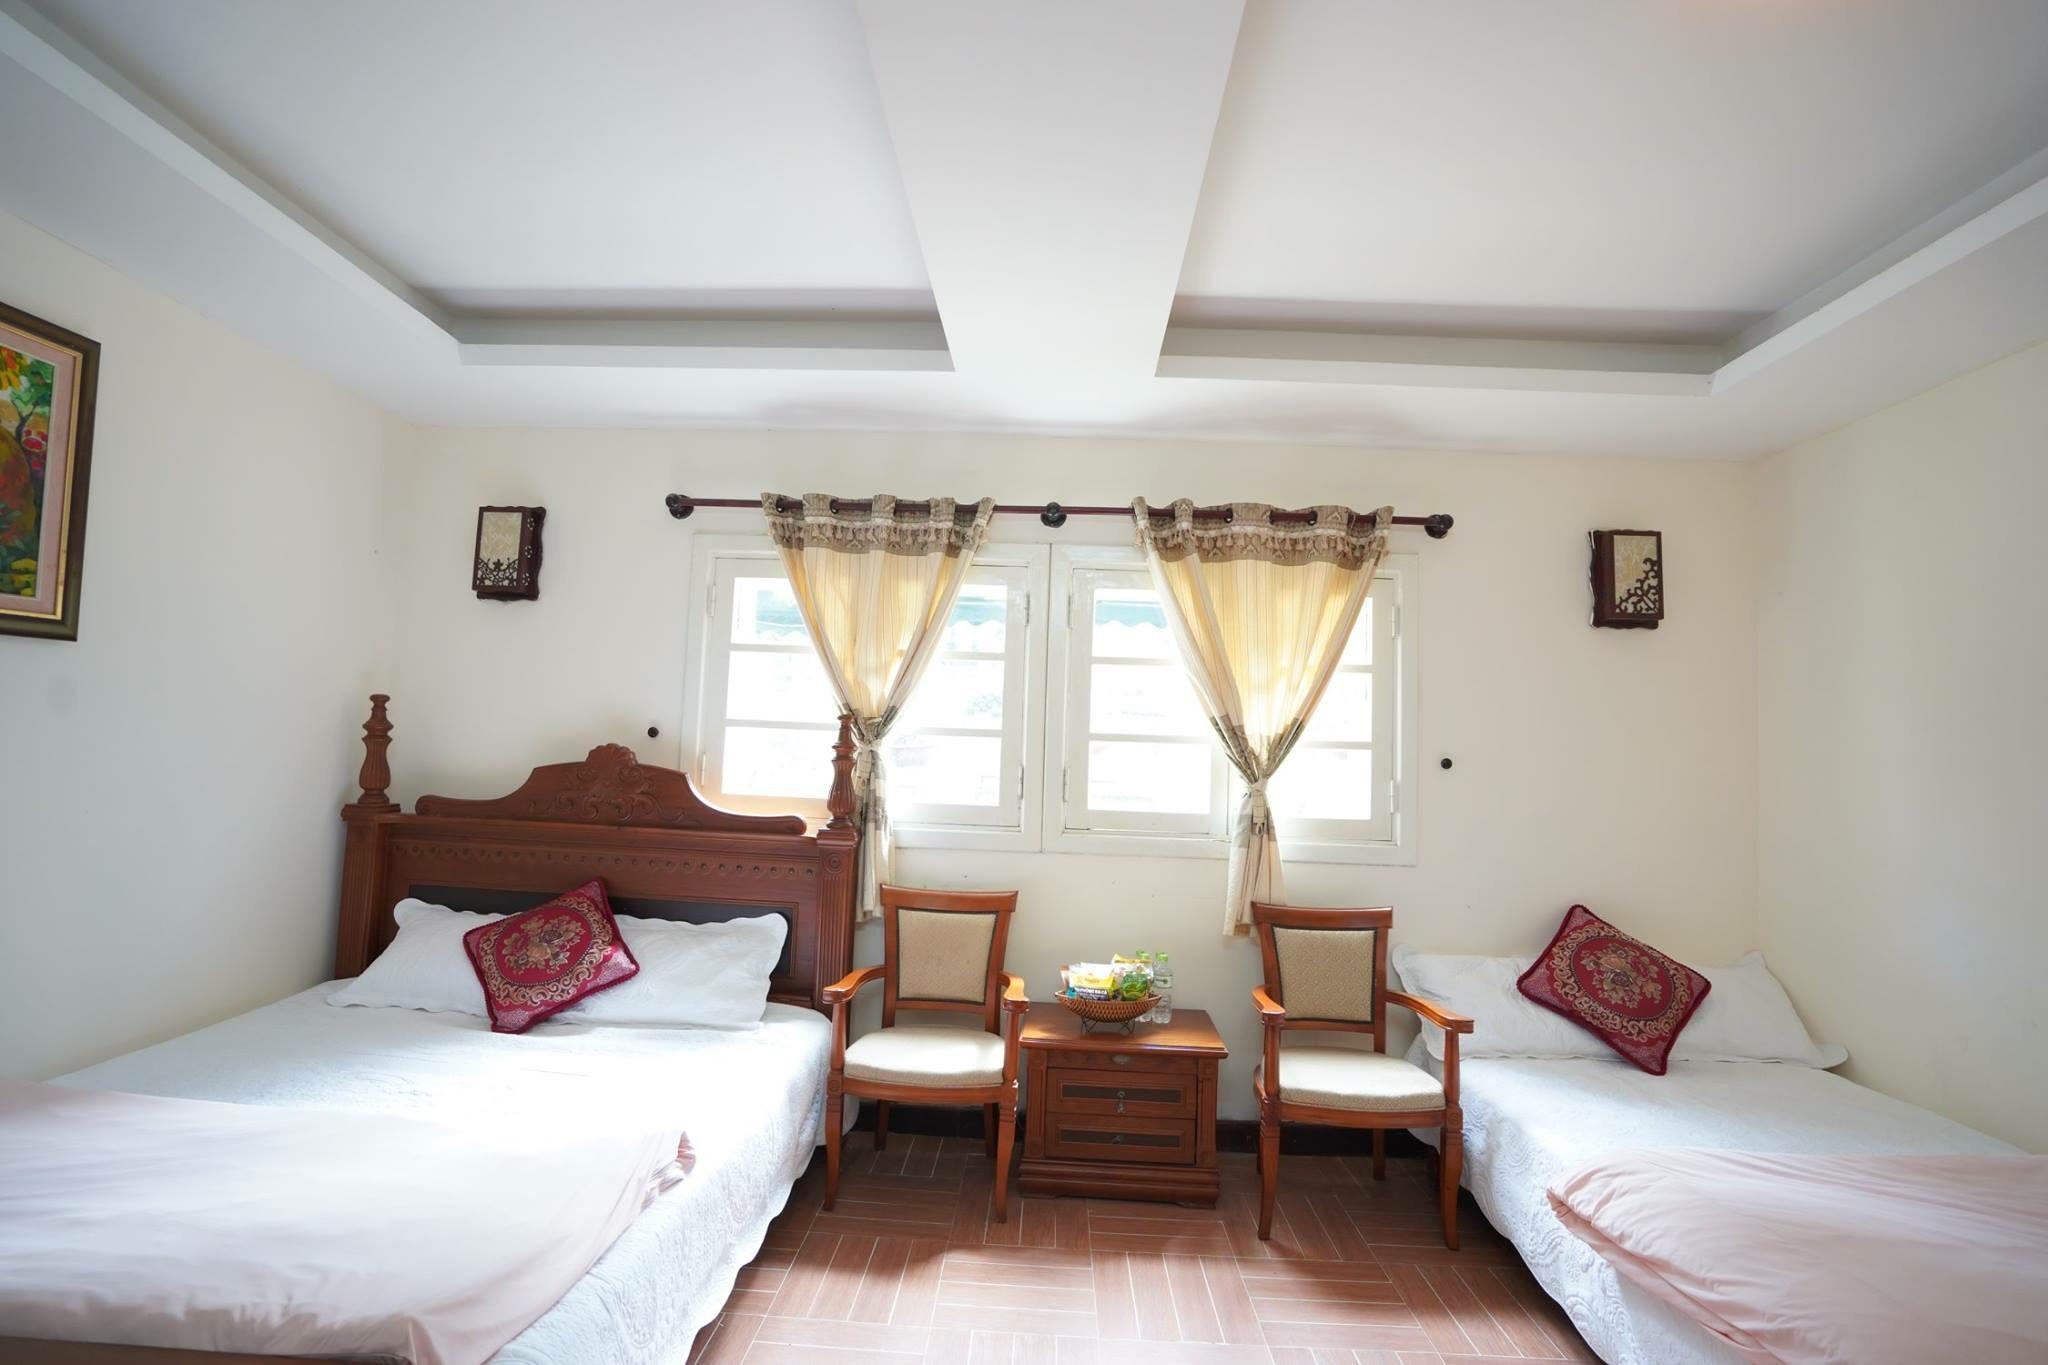 Biet Thu Phap Emilie Room 104